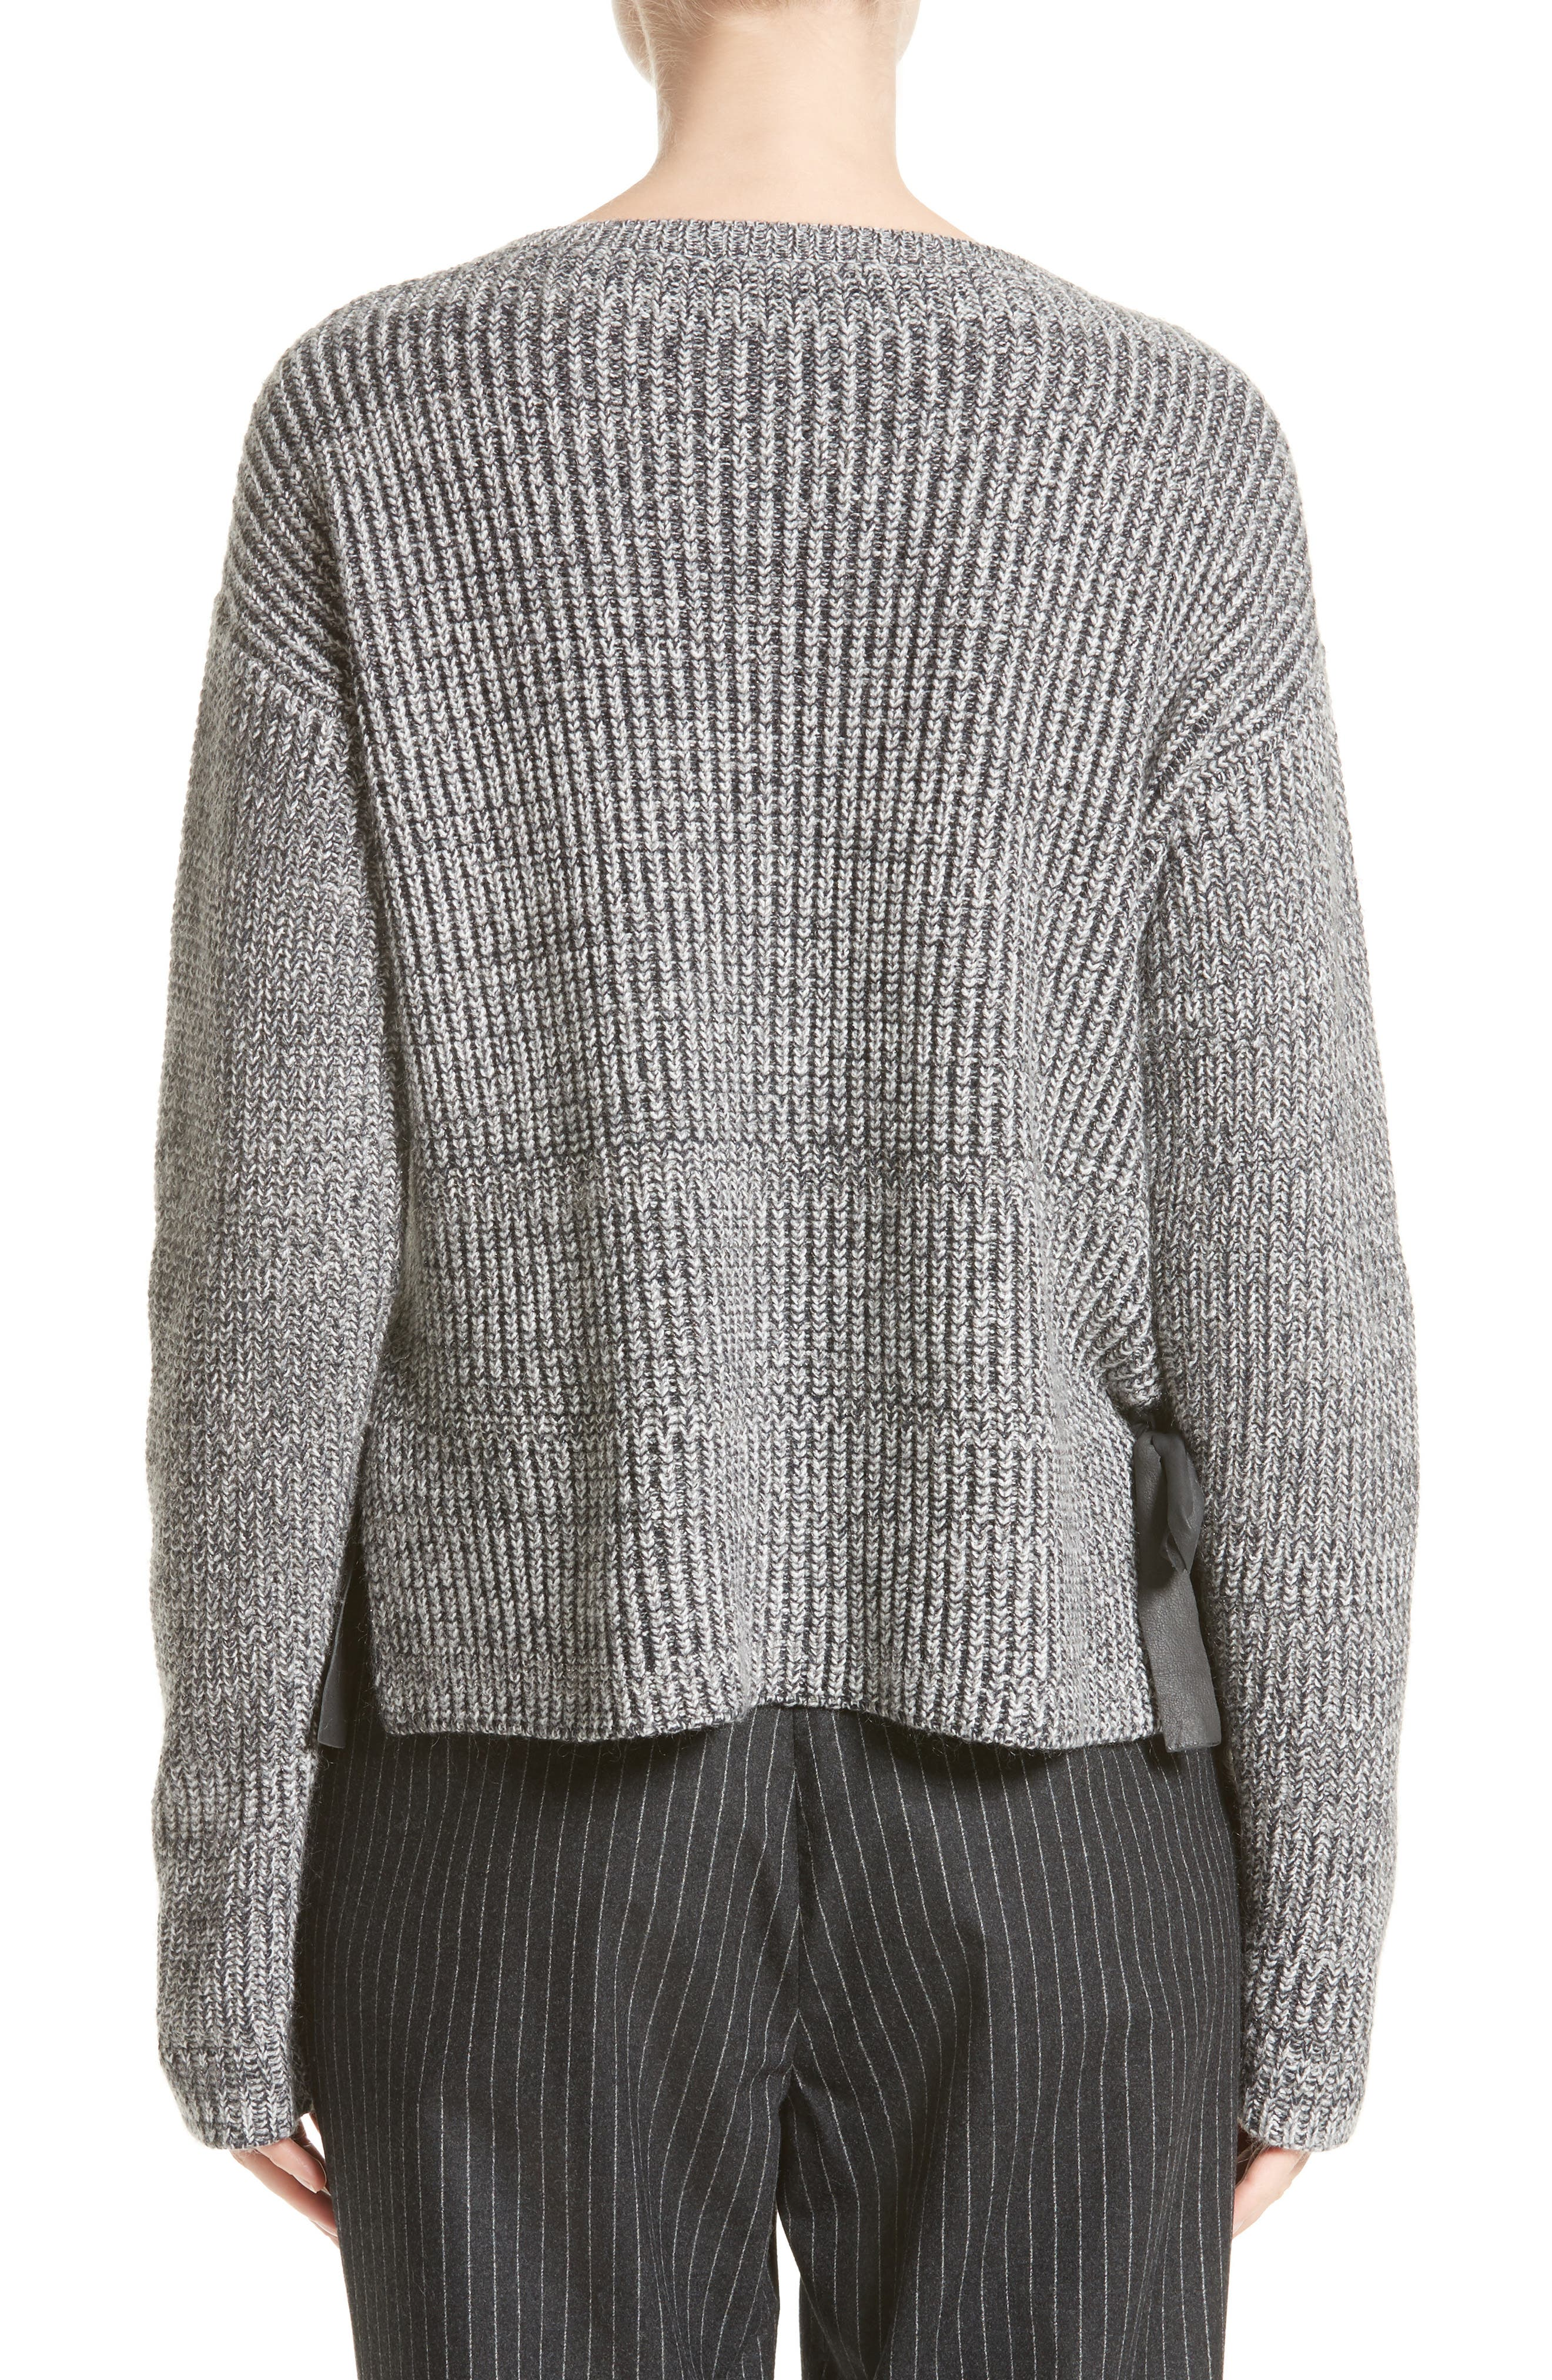 Herringbone Stitch Wool Blend Sweater,                             Alternate thumbnail 2, color,                             Grey Multi